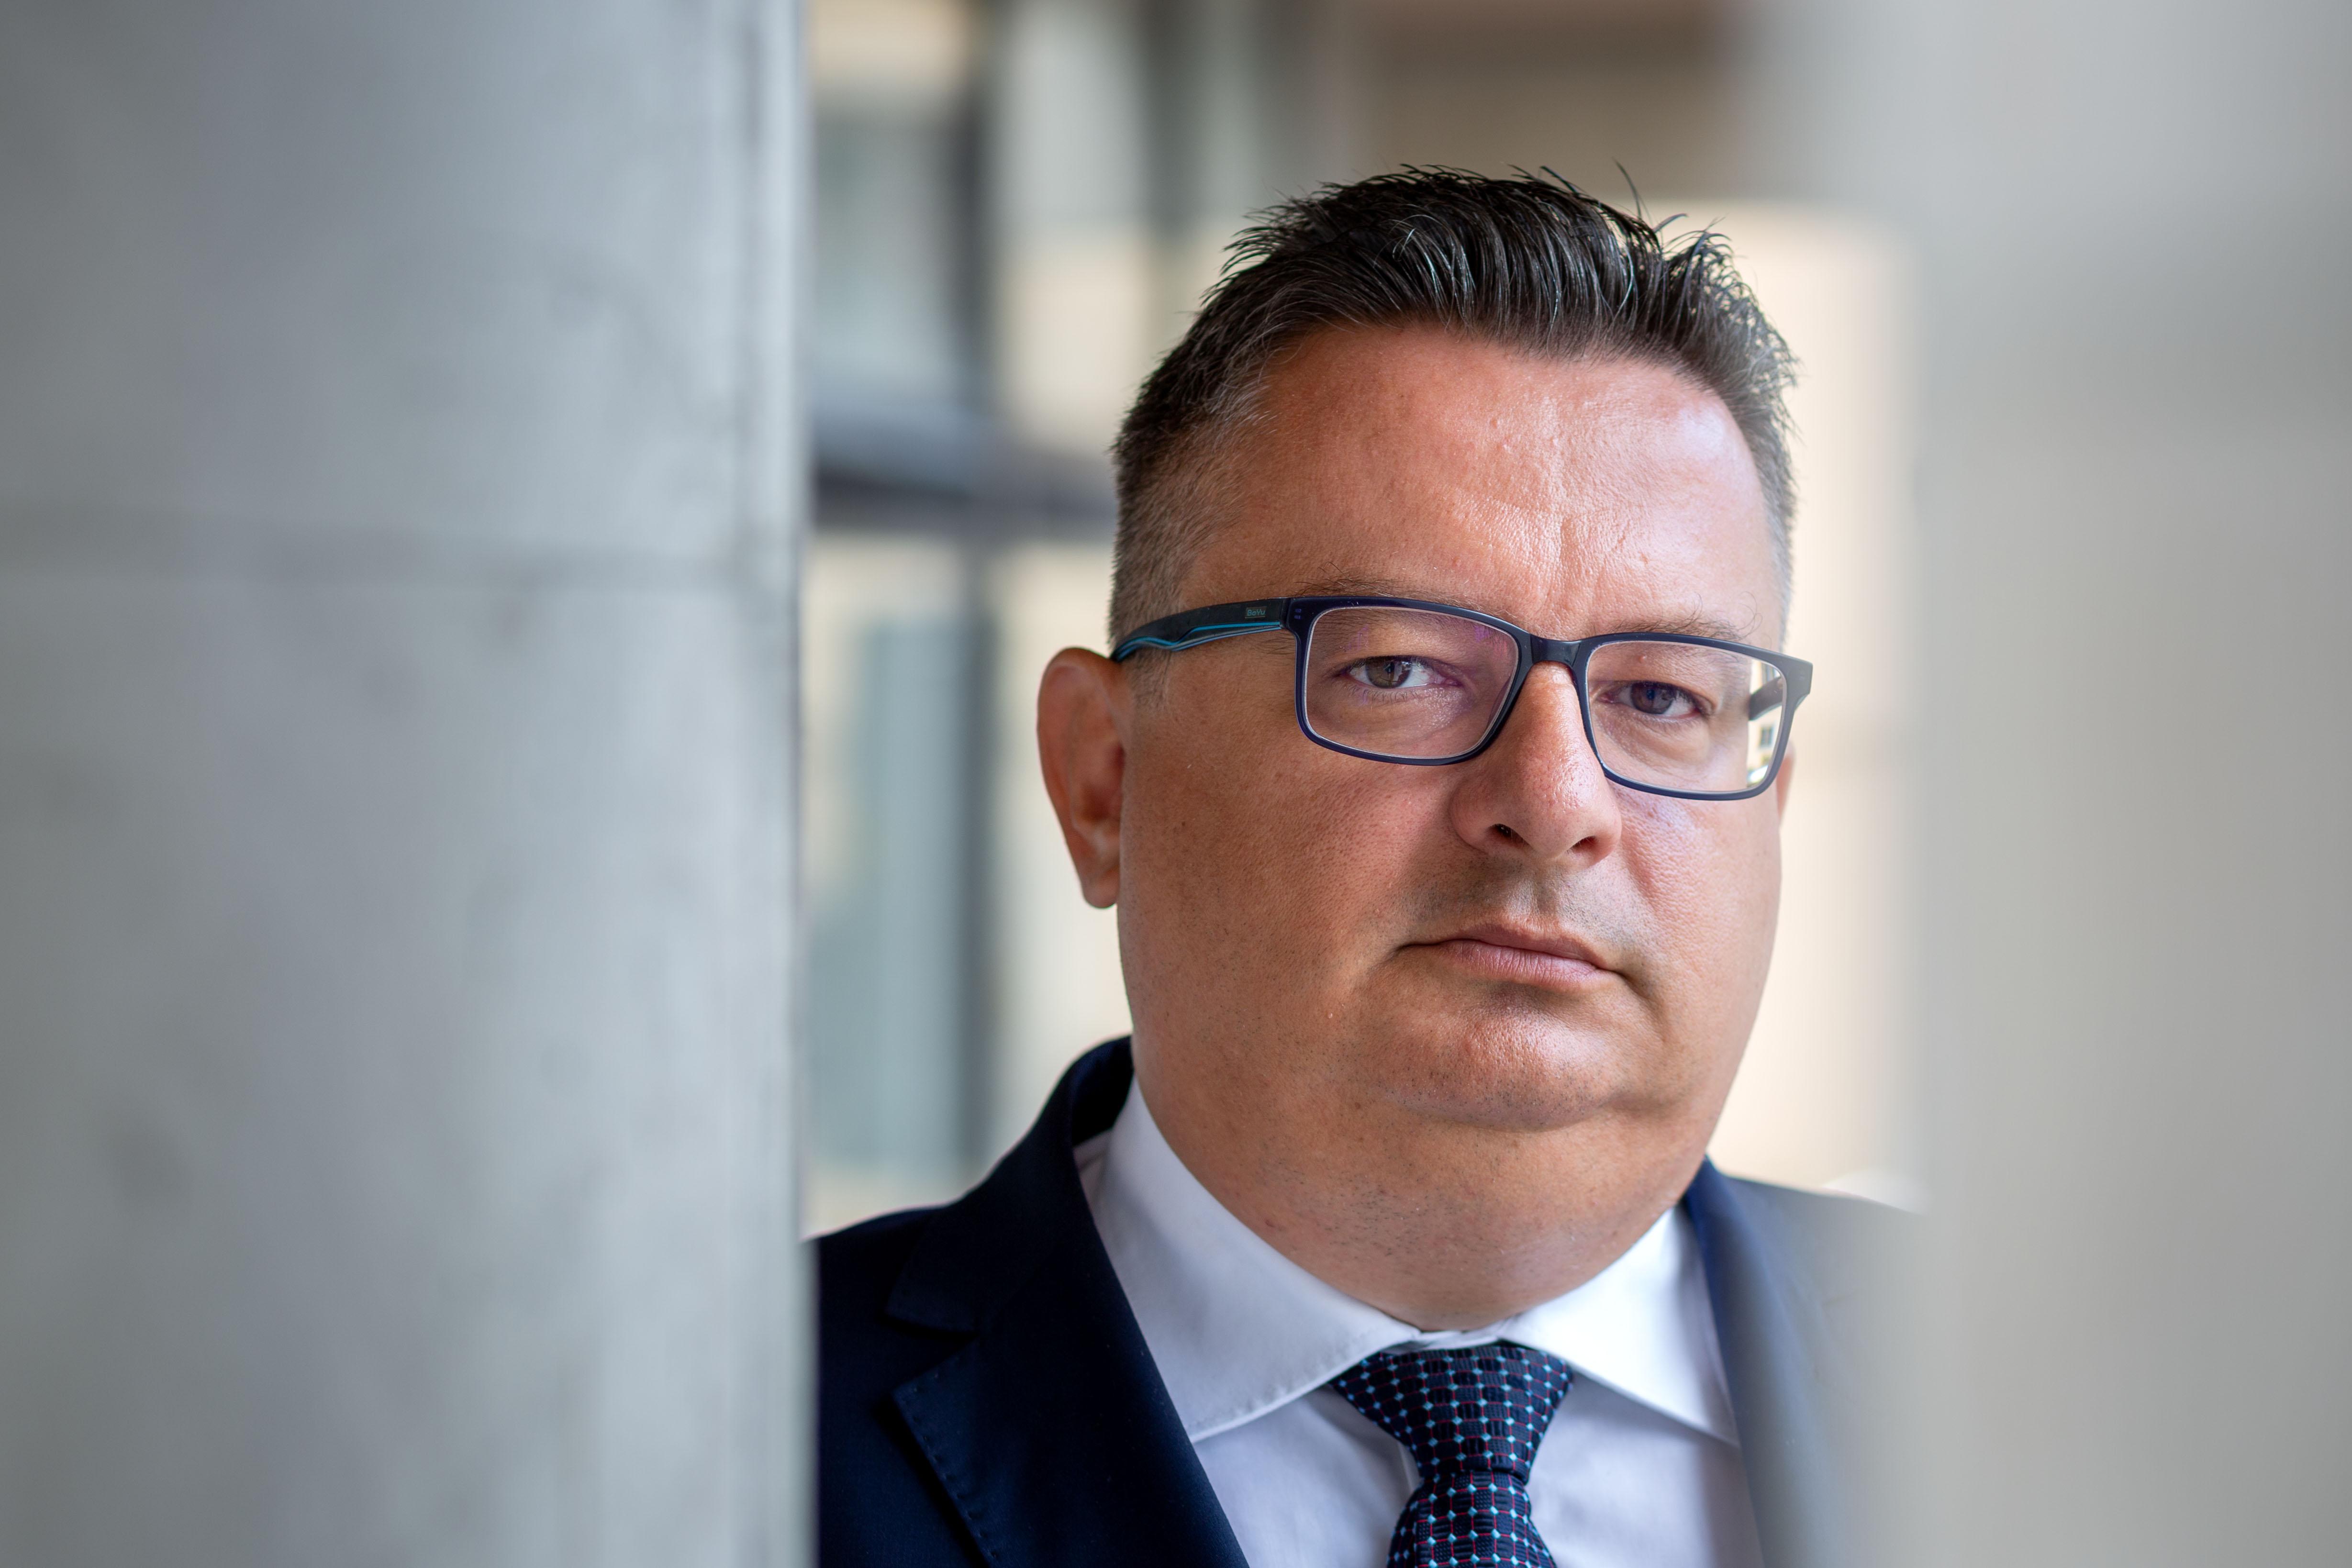 Predseda Okresného súdu v Žiline Jaroslav Macek. Foto N - Tomáš Benedikovič